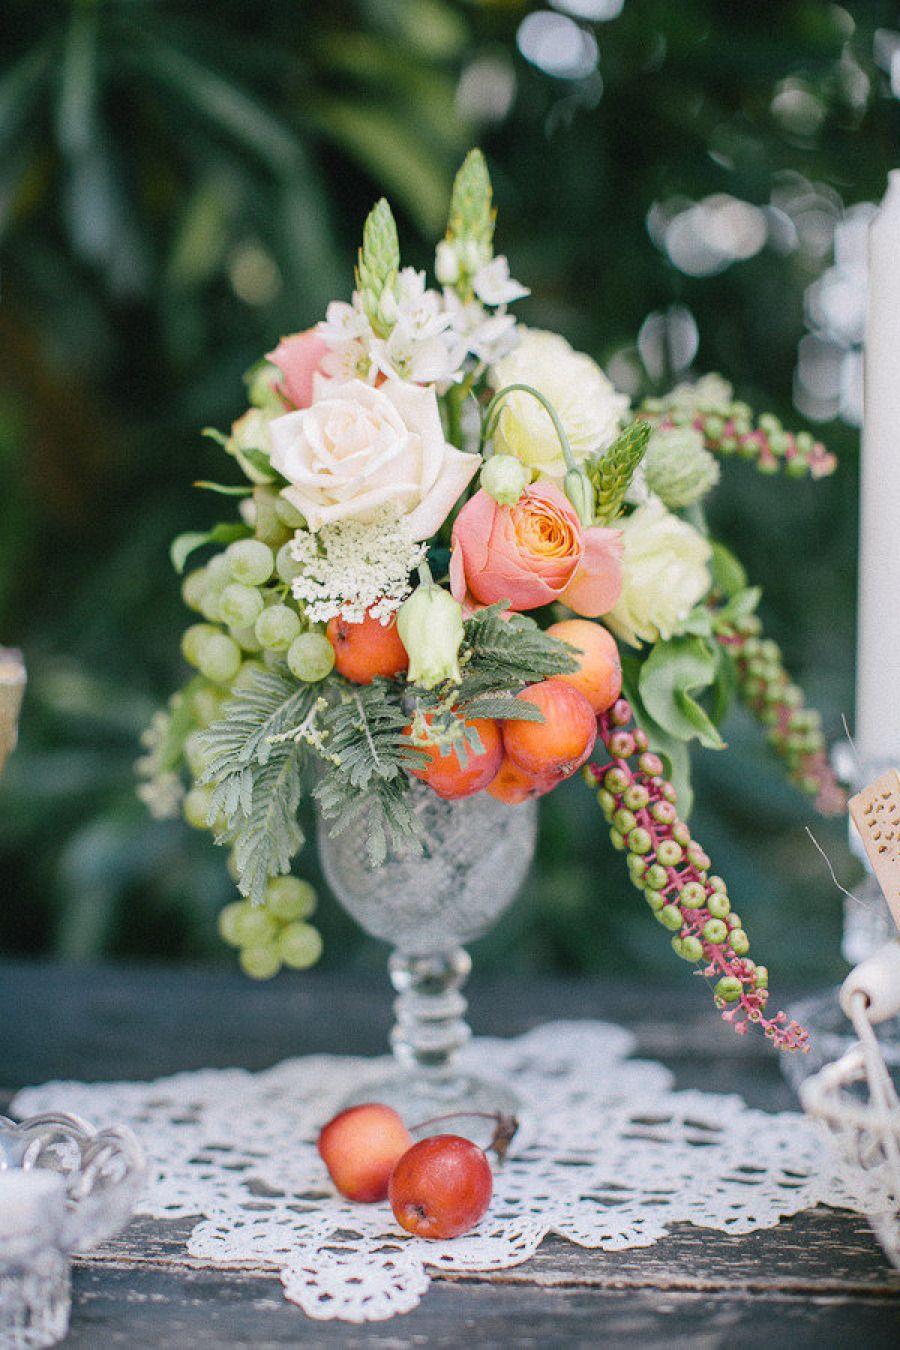 Brilliant wedding centerpiece ideas wedding centerpieces